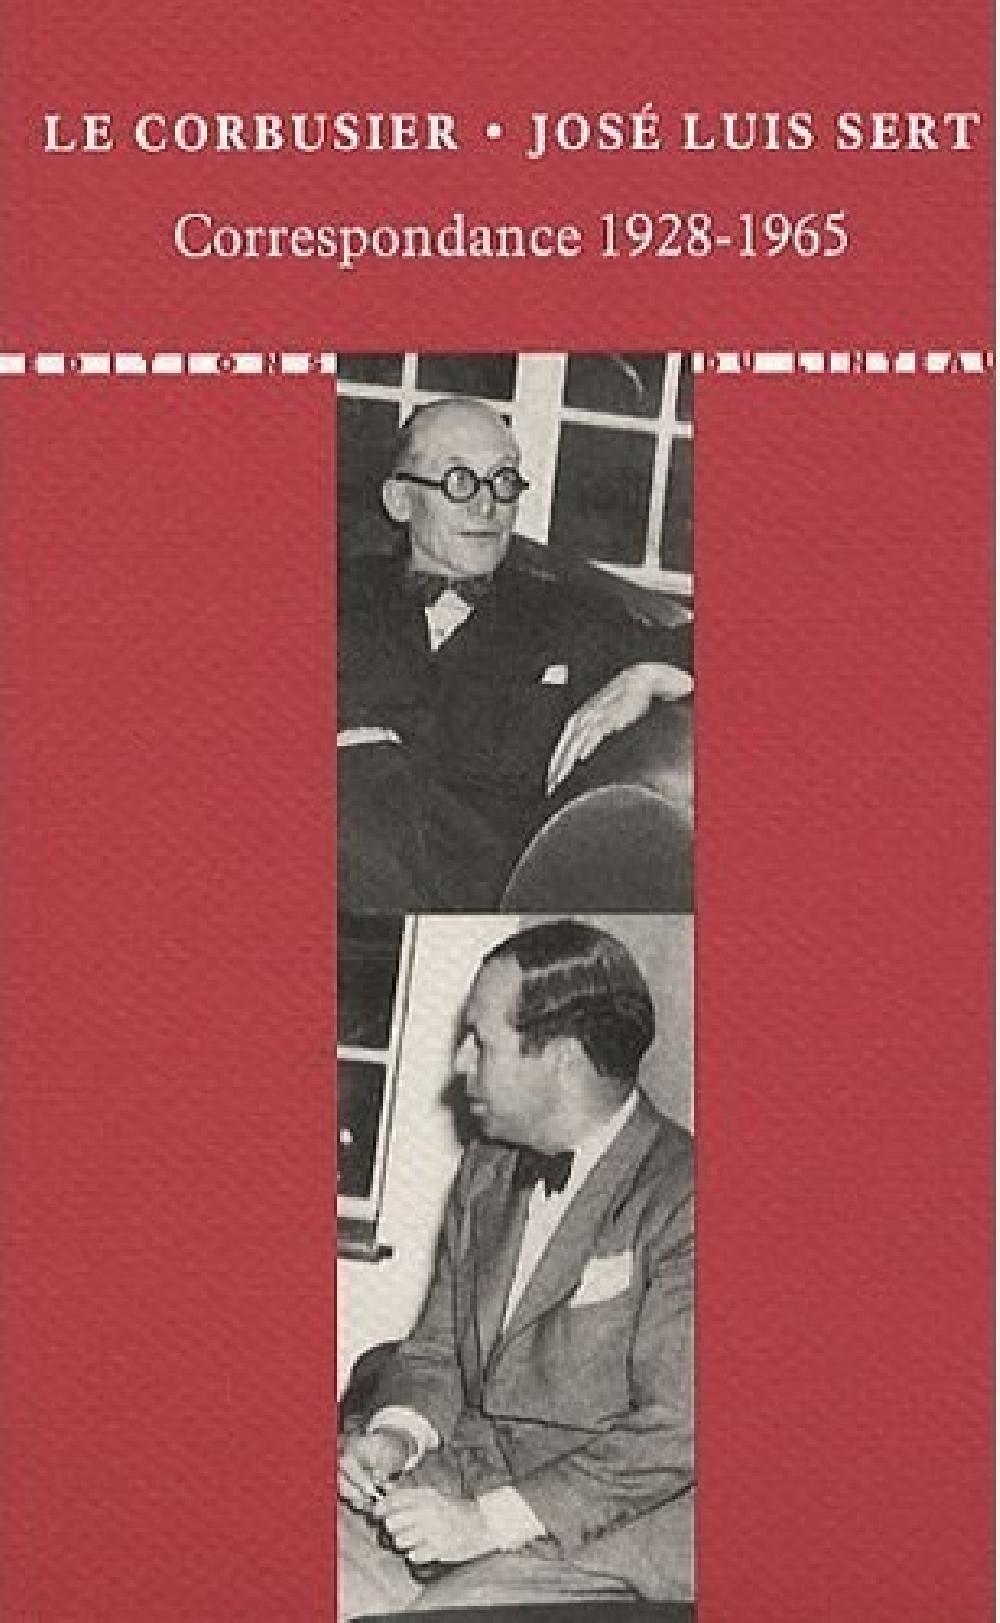 Le Corbusier - José Luis Sert